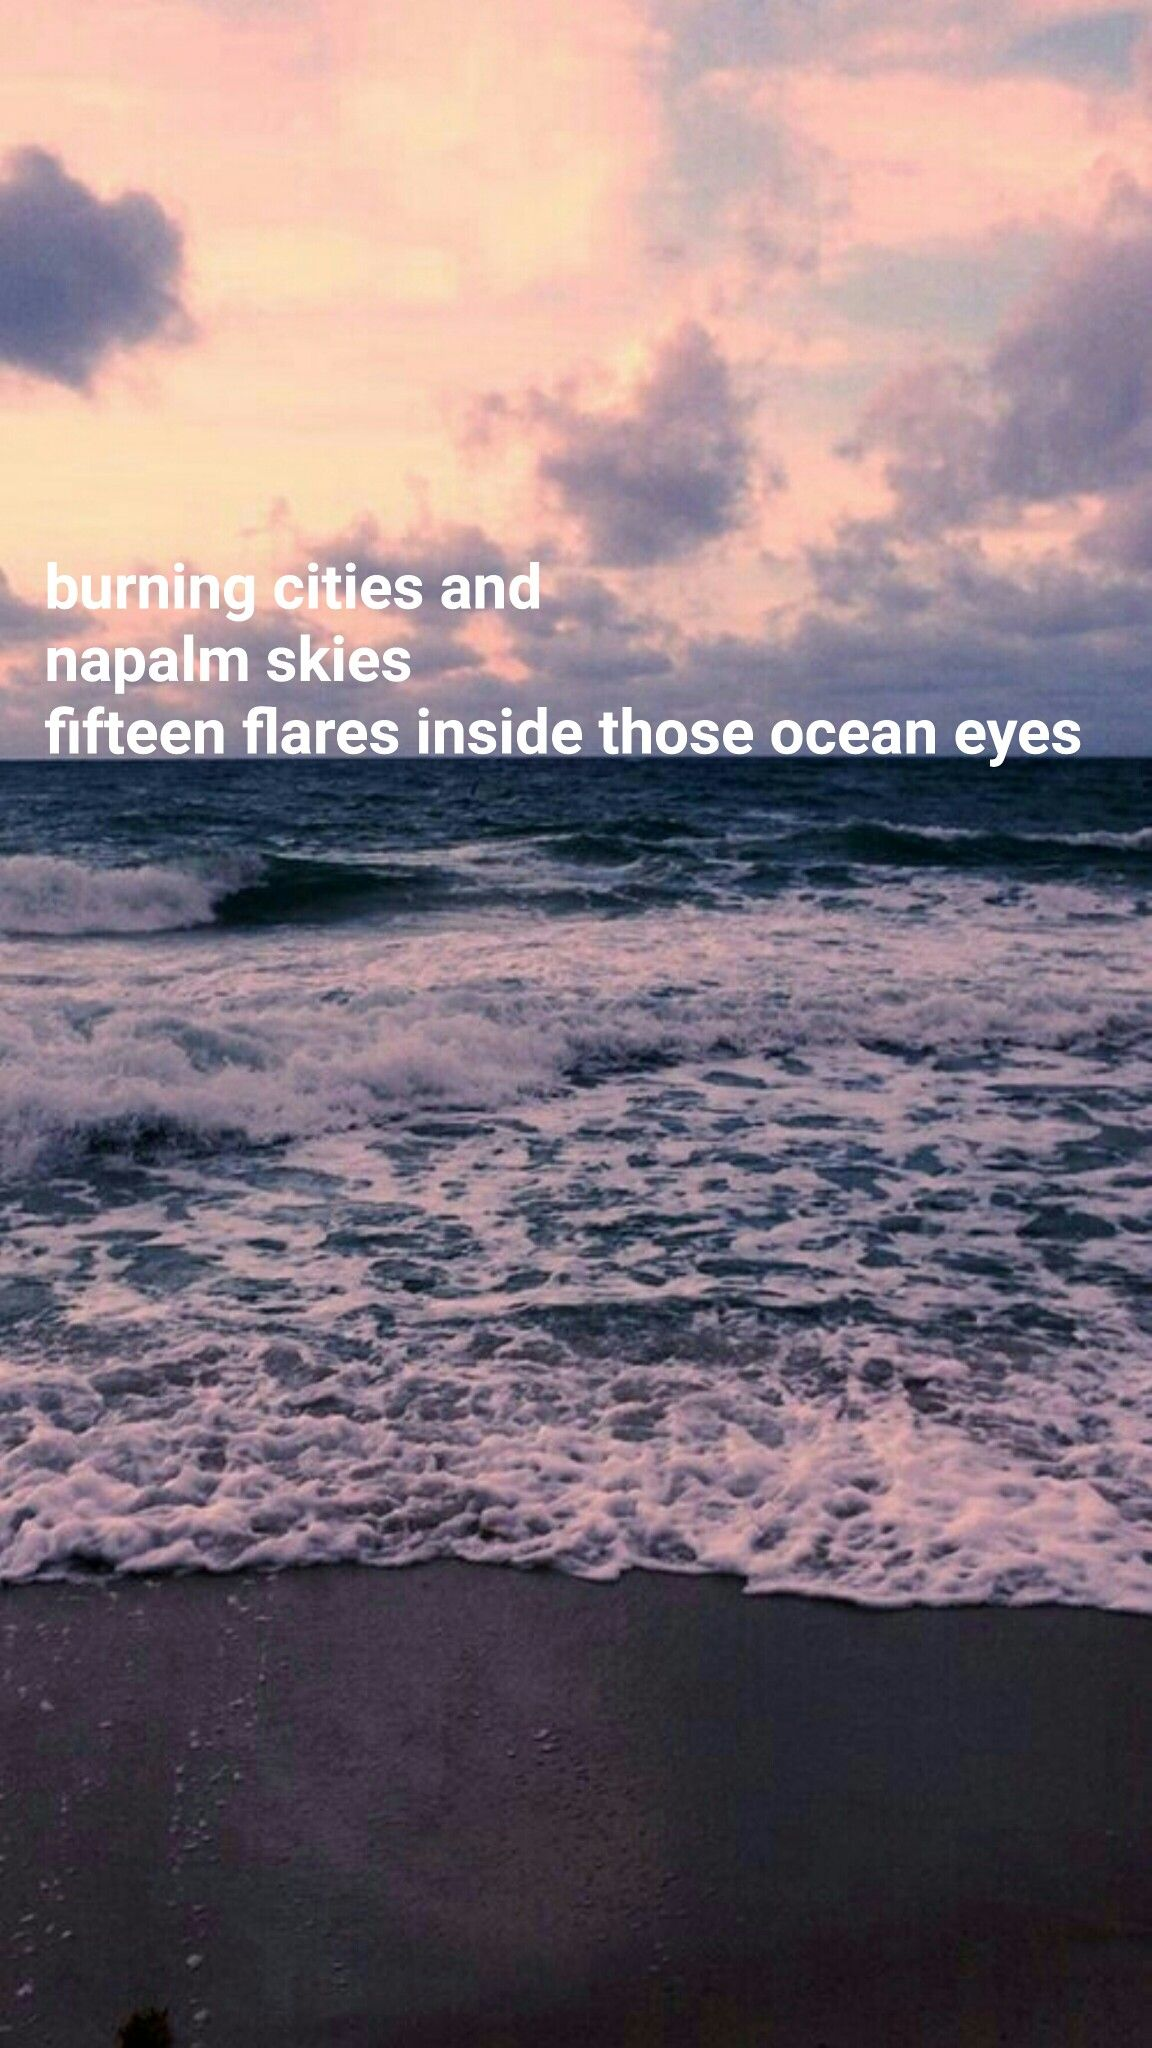 Billie Eilish Ocean Eyes Lyrics Wallpaper Aesthetic Iphone Android Billie Eilish Ocean Eyes Ocean Blue Eyes Ocean Eyes Lyrics